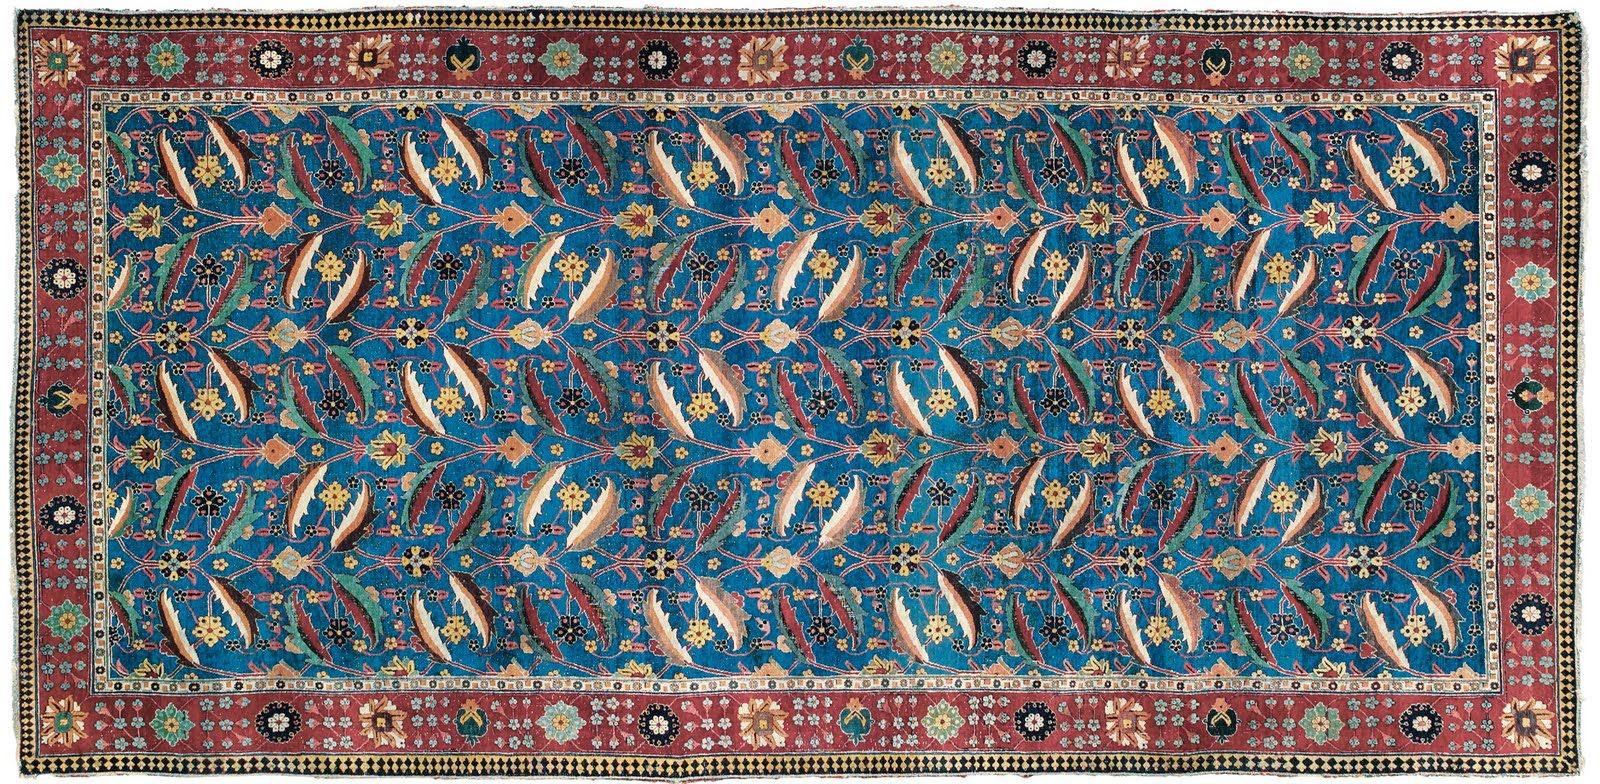 Persian Kirman Rug sold in 2010 for 10M